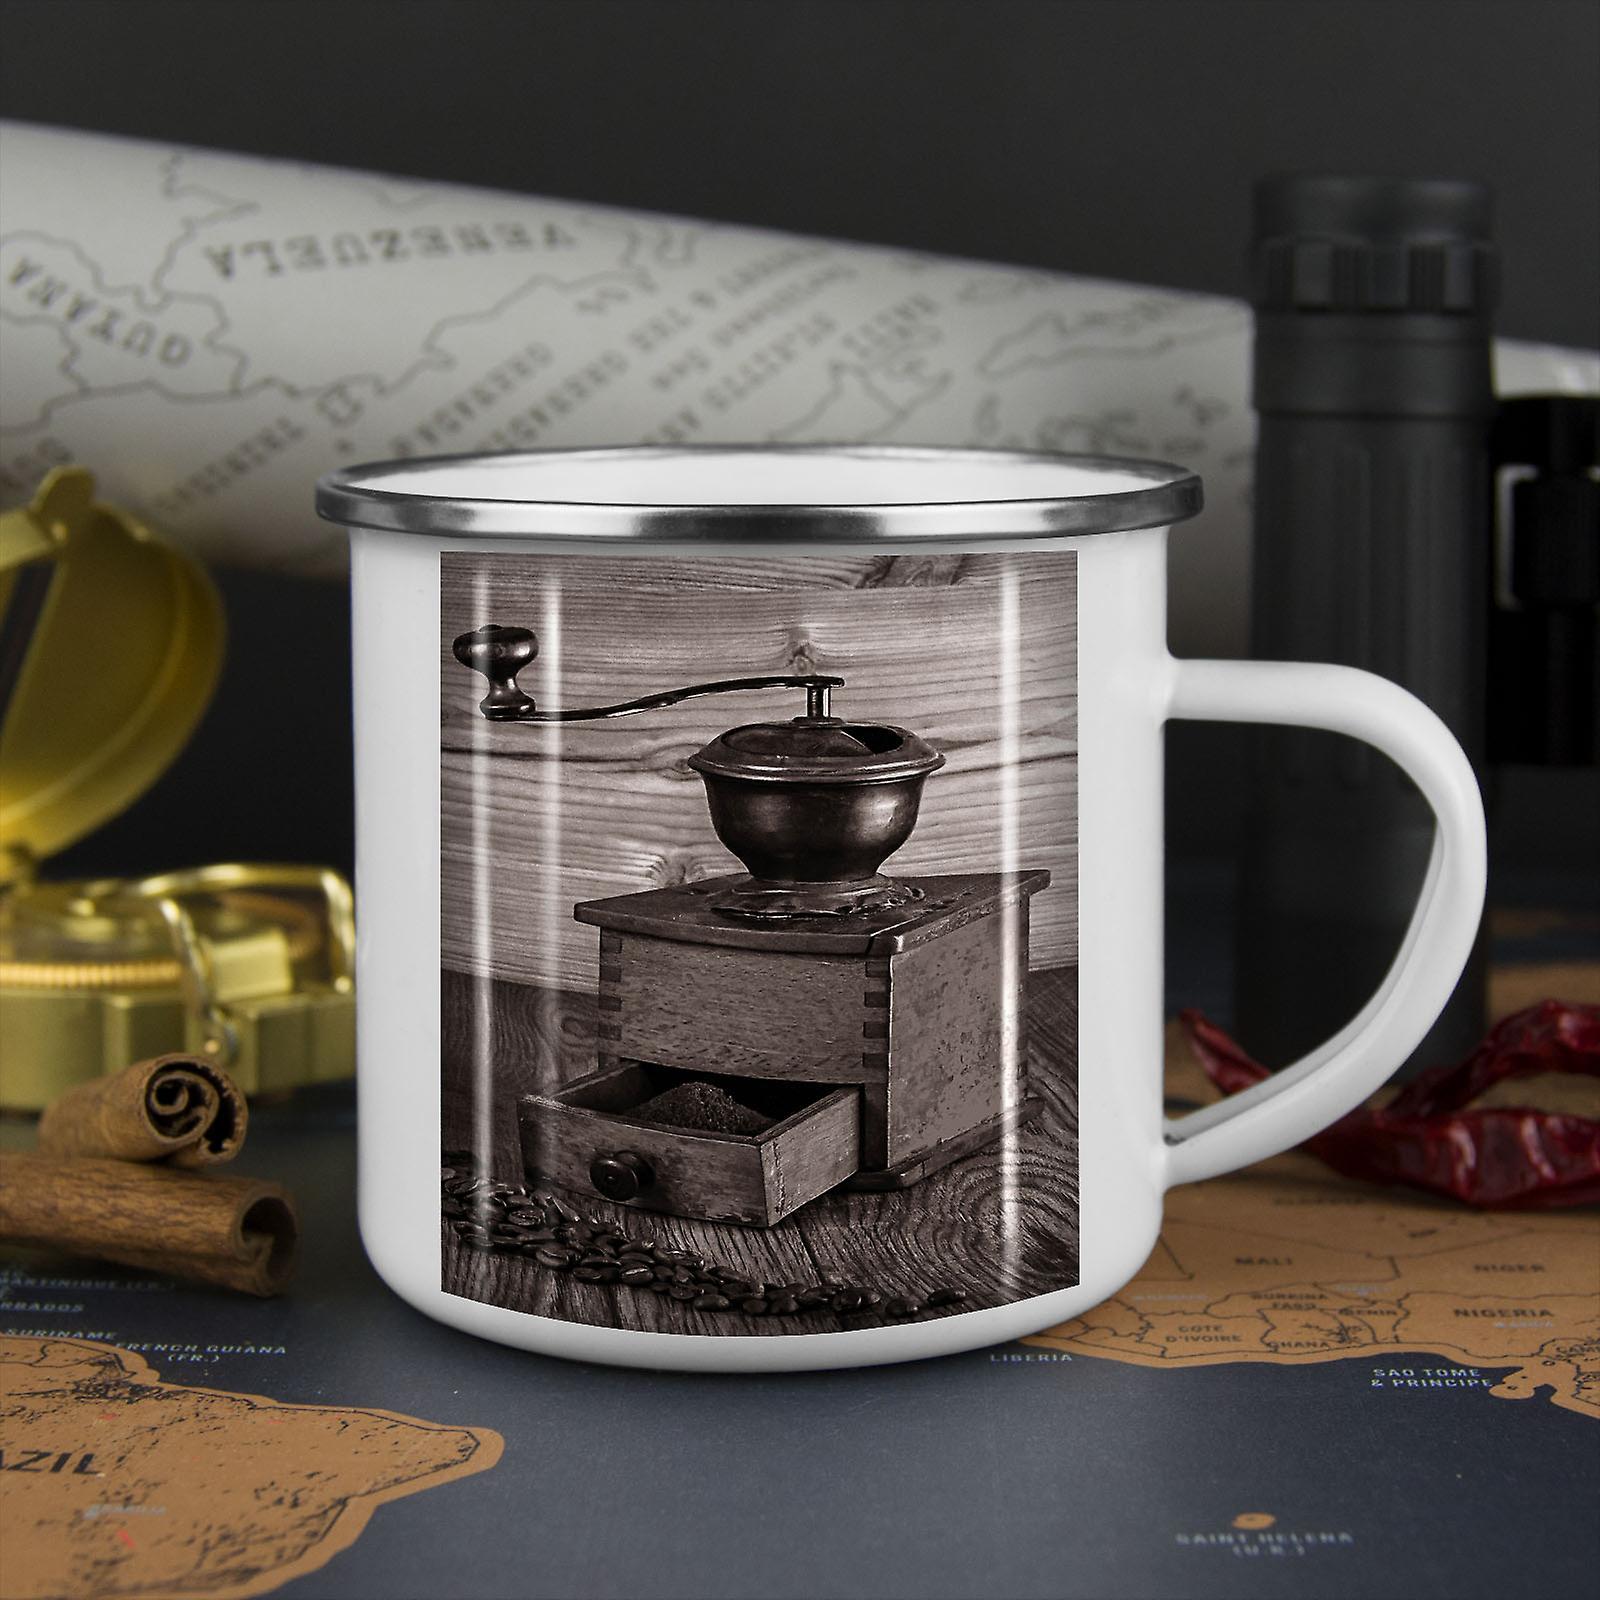 Kaffee Alt coole neue WhiteTea Kaffee Emaille Mug10 oz | Wellcoda